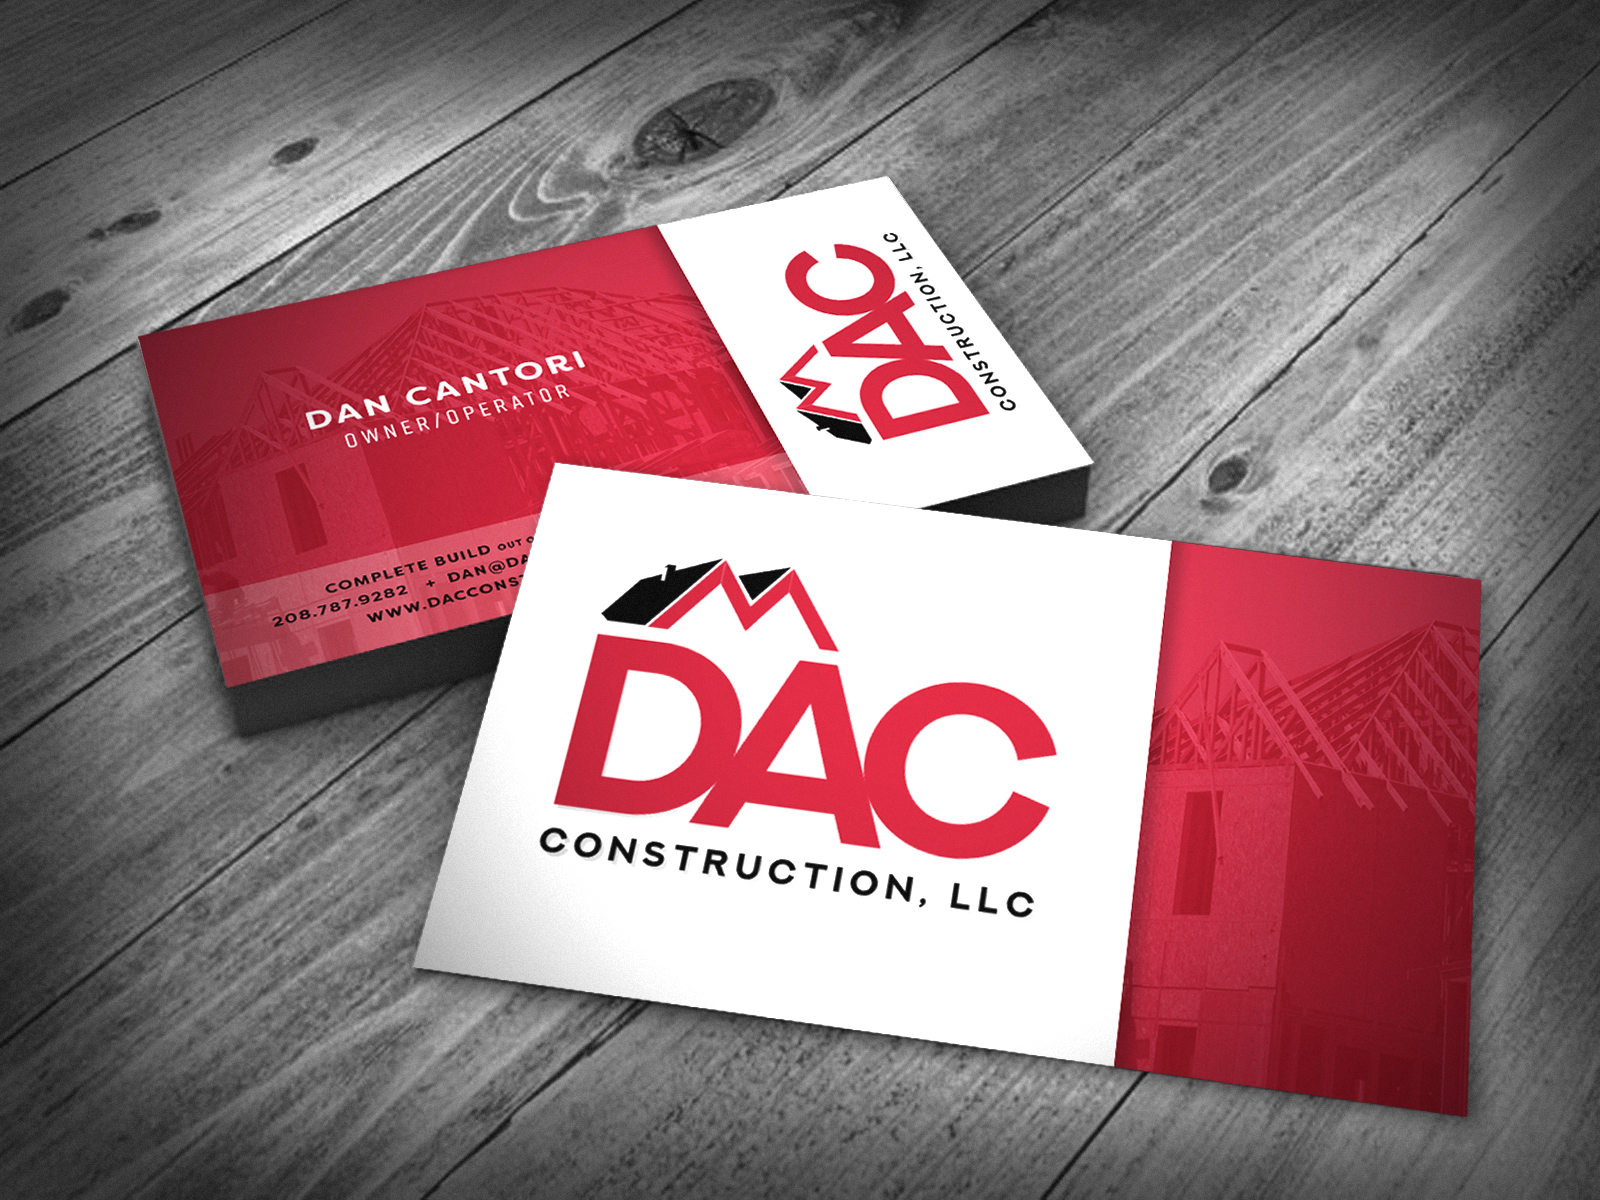 DAC CONSTRUCTION